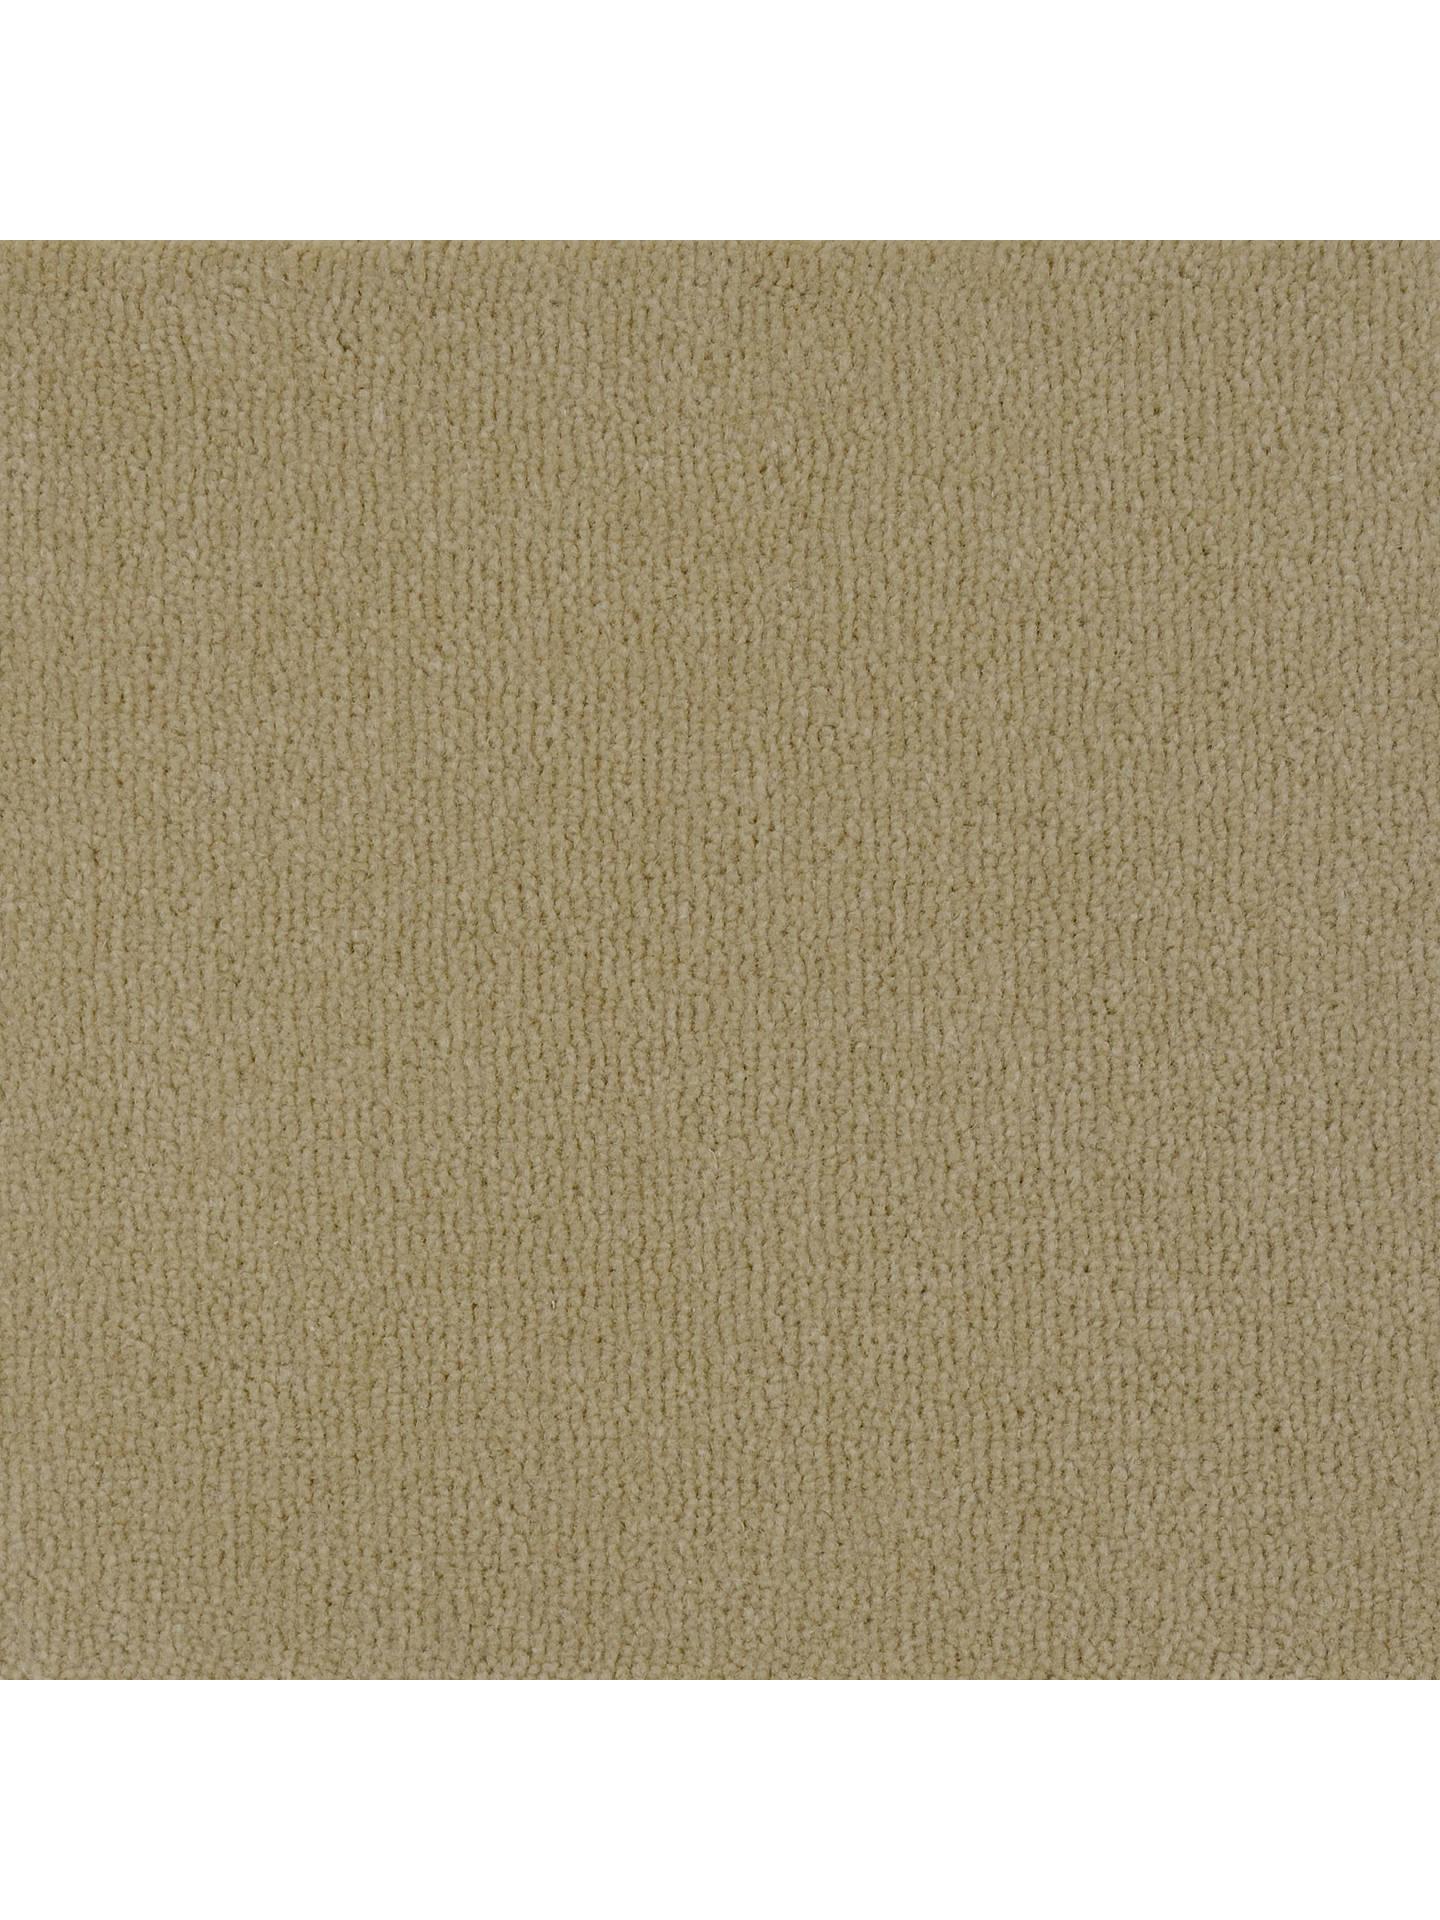 john lewis deep pile wool velvet carpet at john lewis. Black Bedroom Furniture Sets. Home Design Ideas